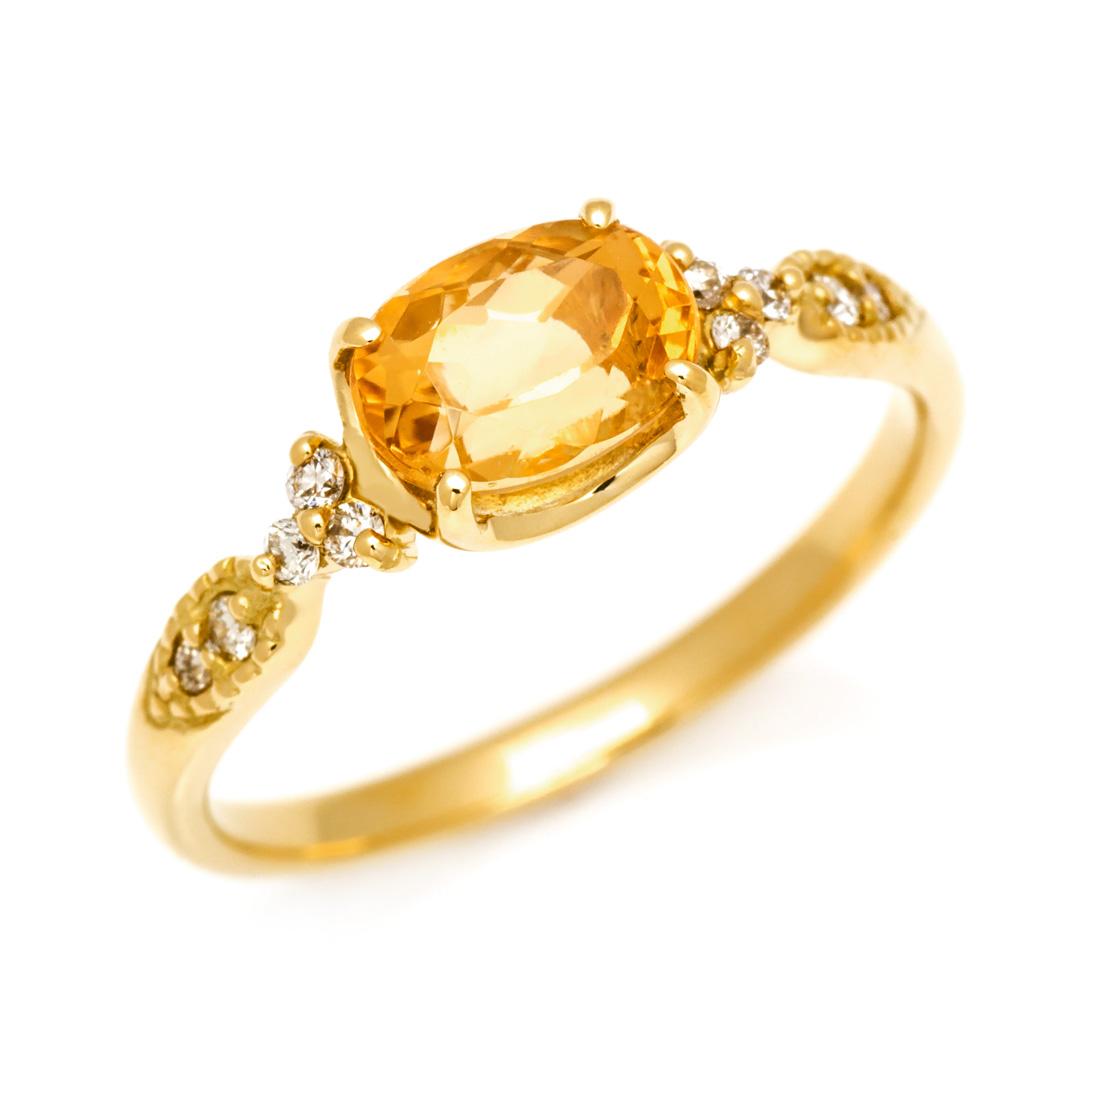 【GWクーポン配布中】K18 インペリアルトパーズ ダイヤモンド リング 「amanza」送料無料 指輪 ダイアモンド ゴールド 18K 18金 誕生日 11月誕生石 刻印 文字入れ メッセージ ギフト 贈り物 ピンキーリング対応可能